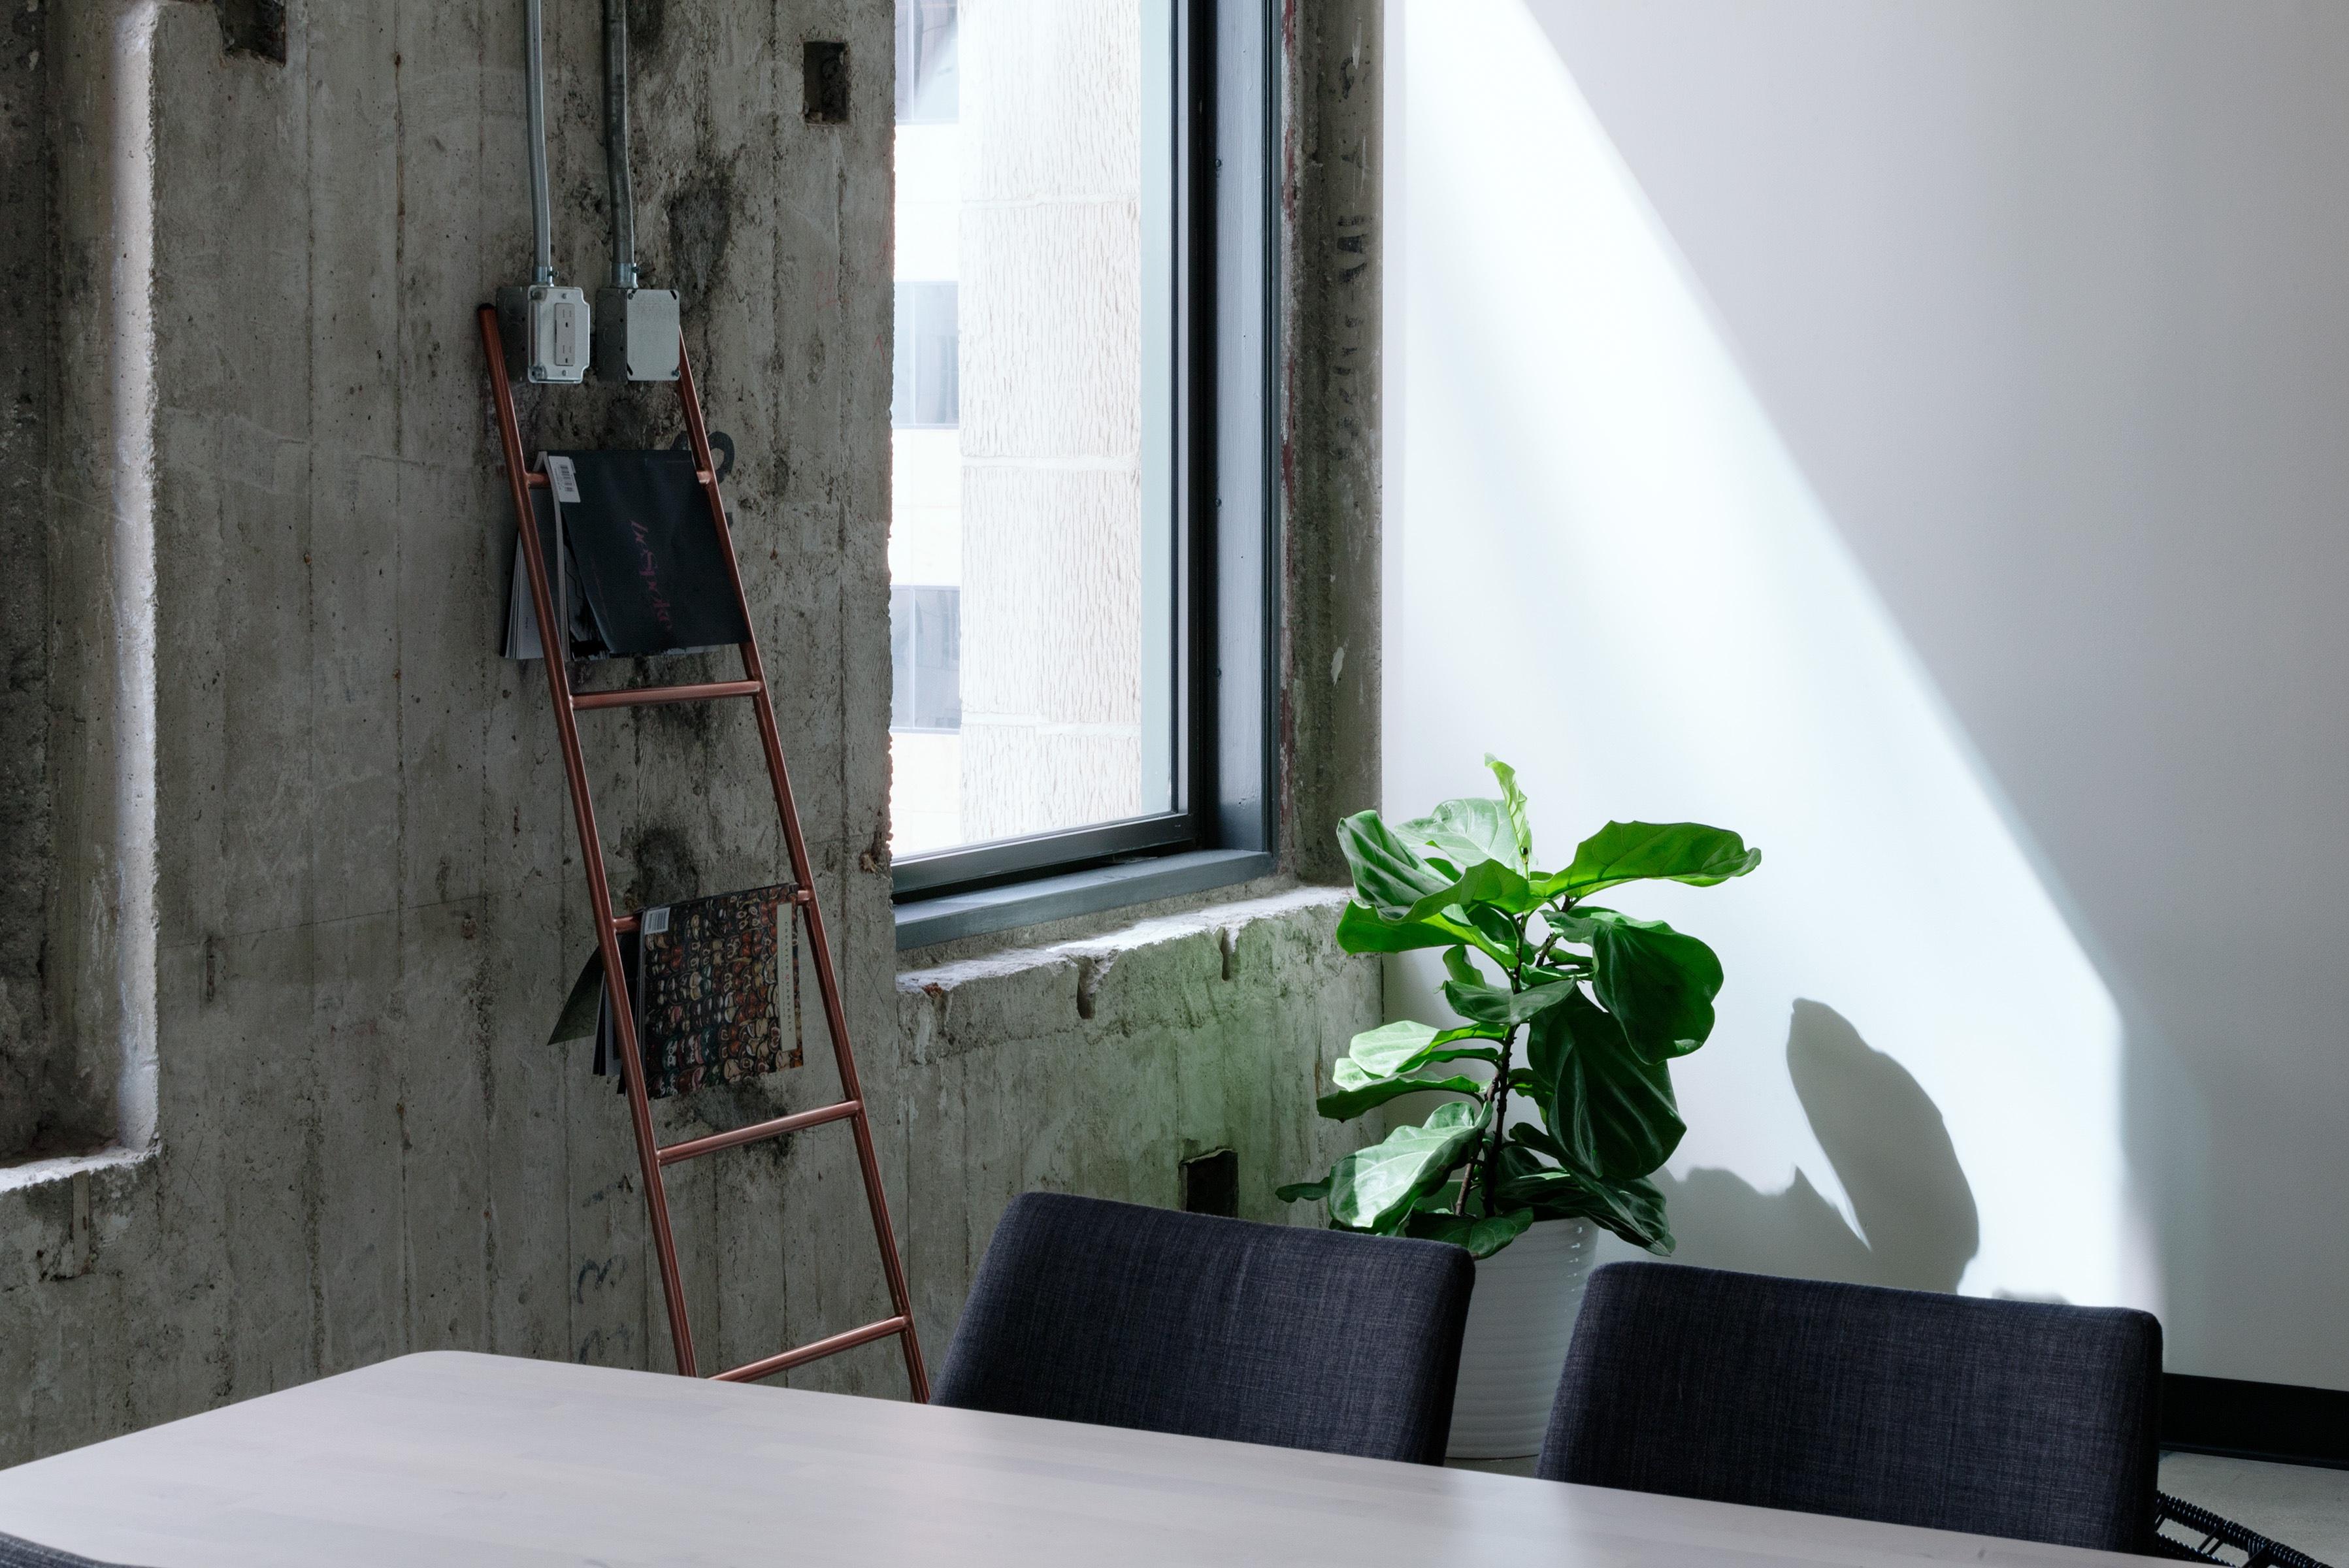 Noisy Neighbors Ways To Soundproof Your Apartment From Frugal - How to soundproof your apartment floor